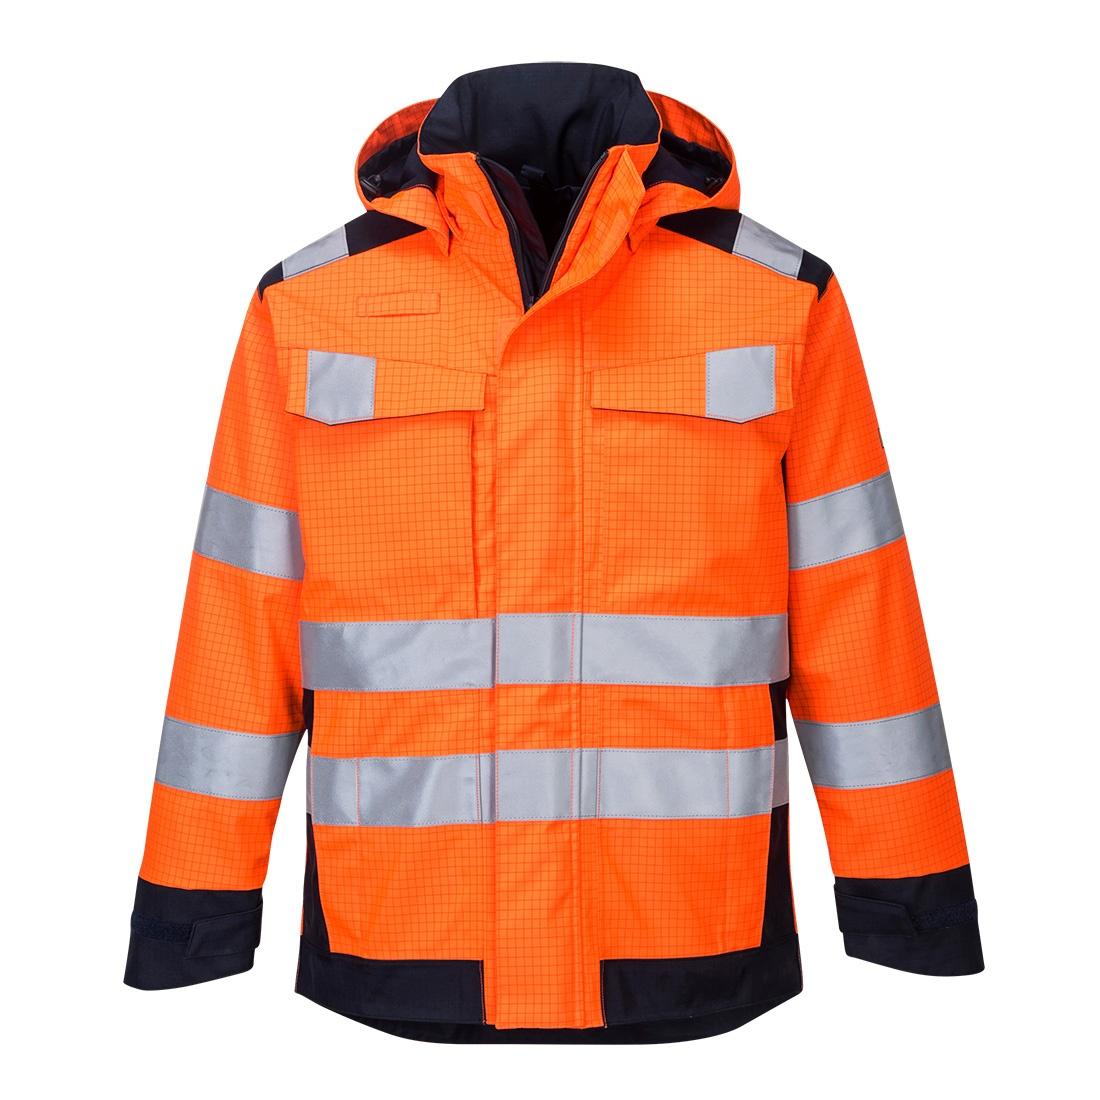 Portwest Modaflame Rain Jacket - Orange Front